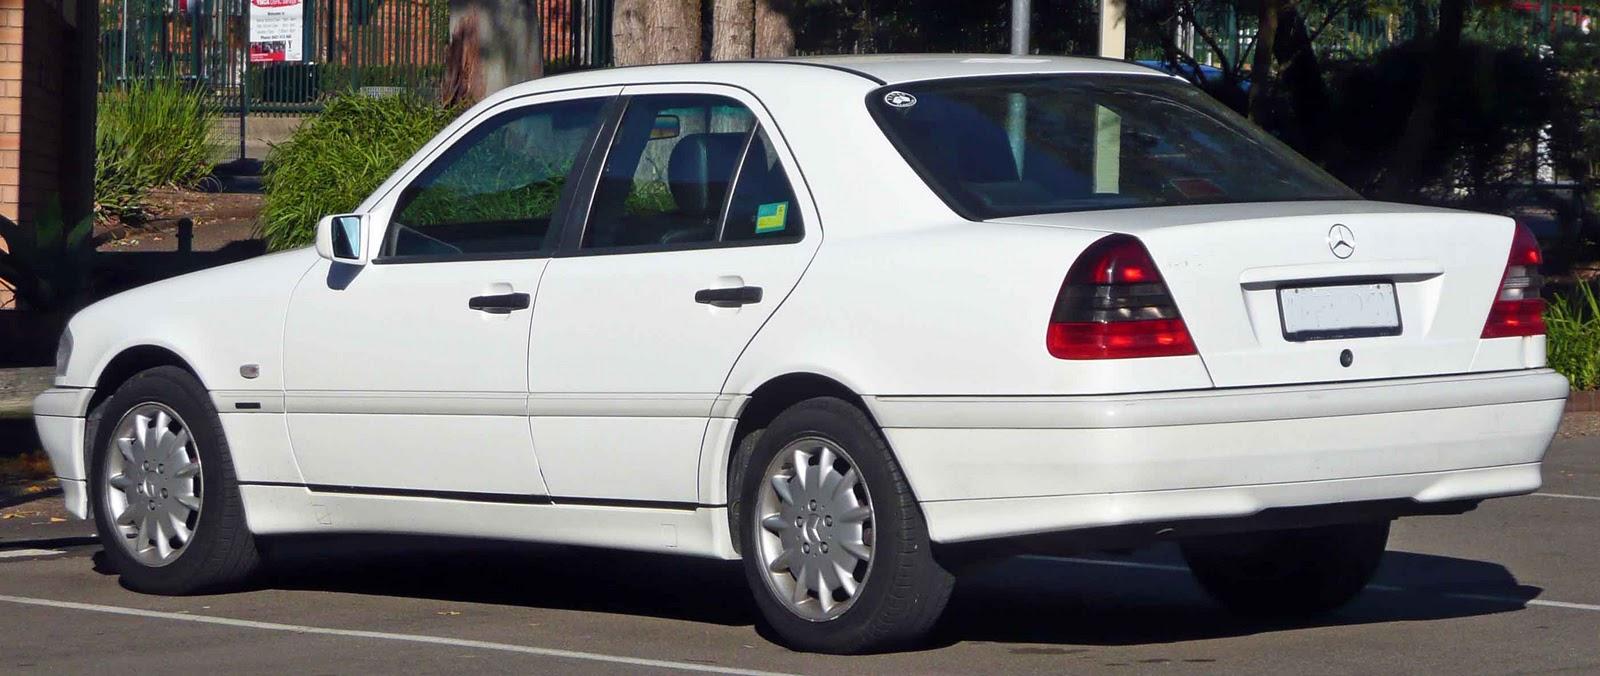 Autoinfo mercedes benz c class w202 1993 2000 for Mercedes benz c class w202